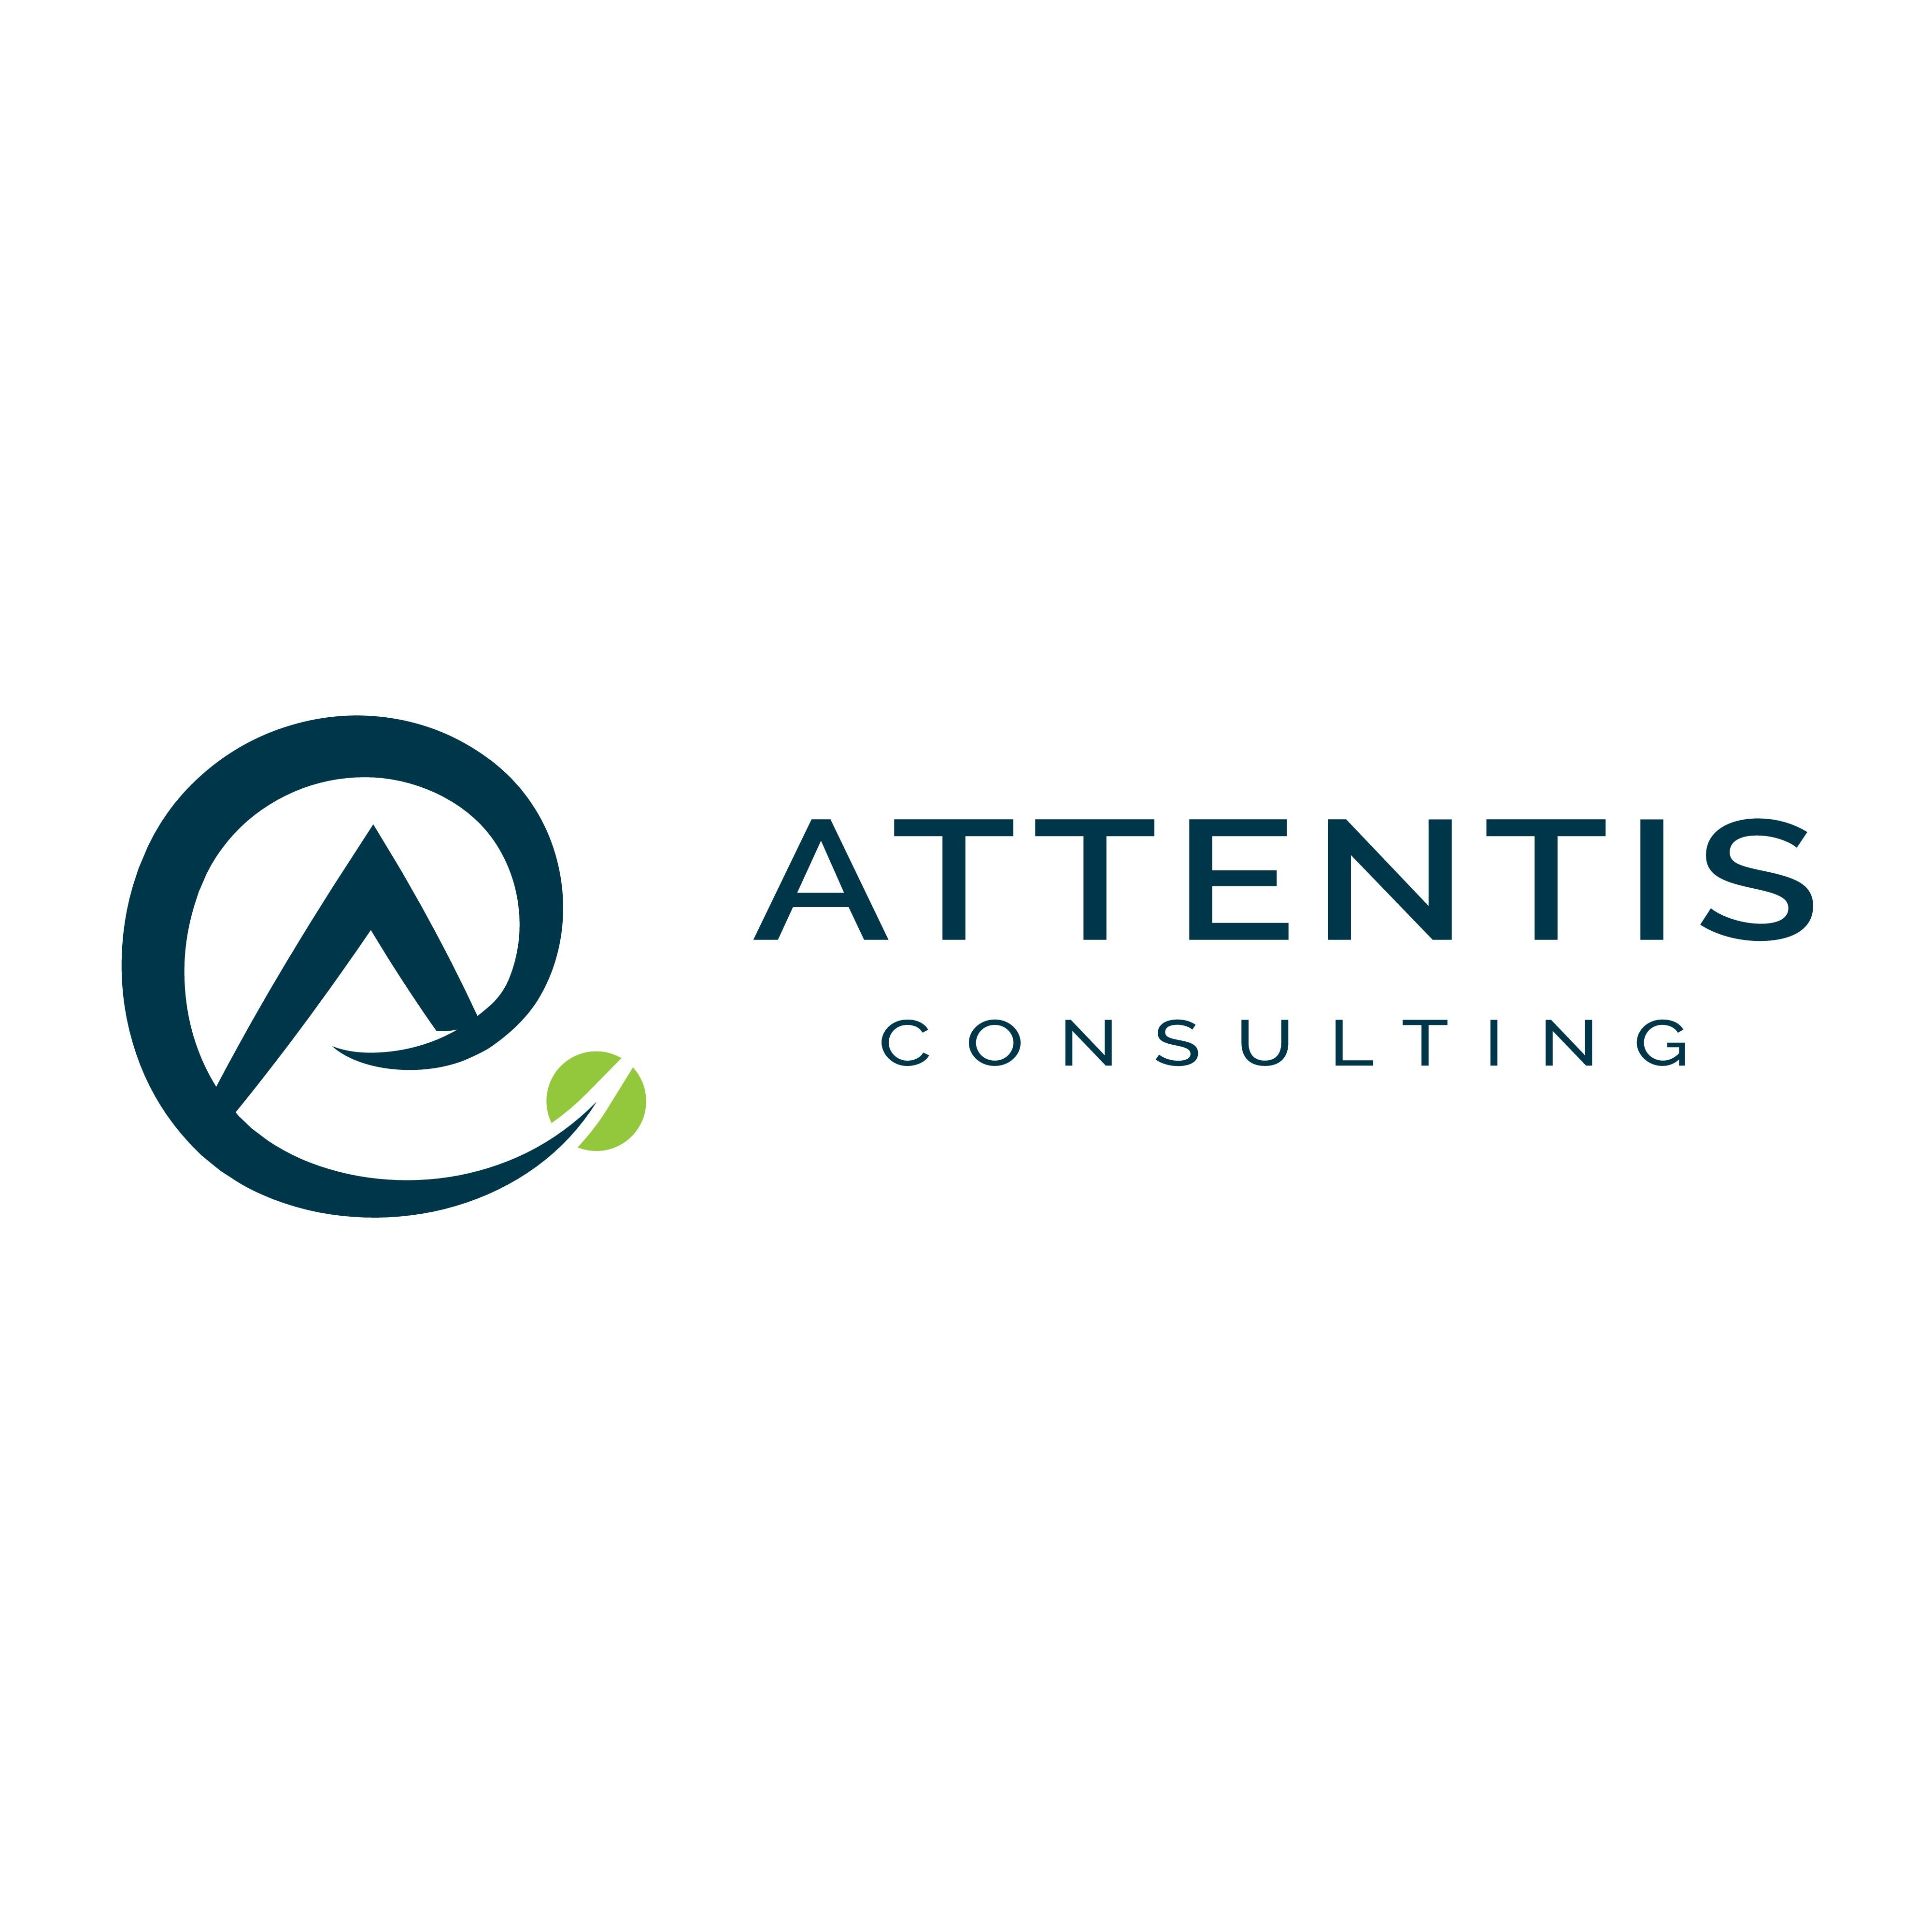 Attentis Consulting Logo